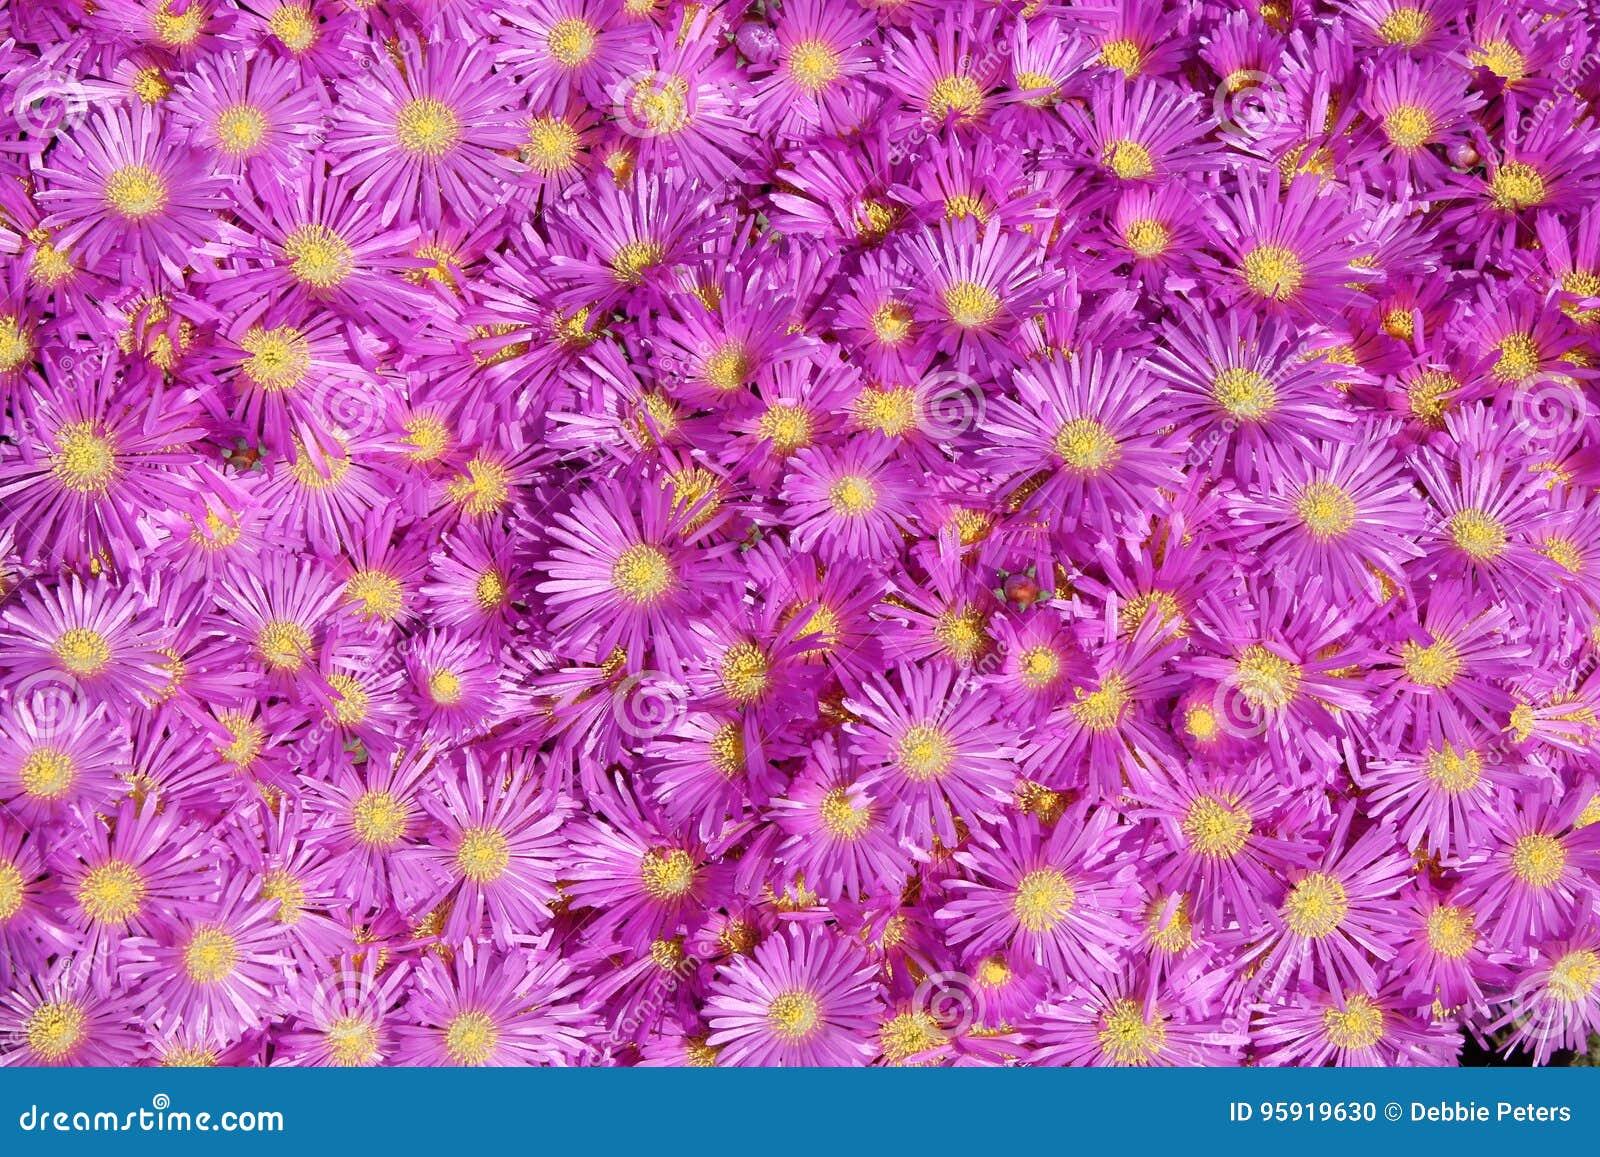 Bright Lavender Ice Plant